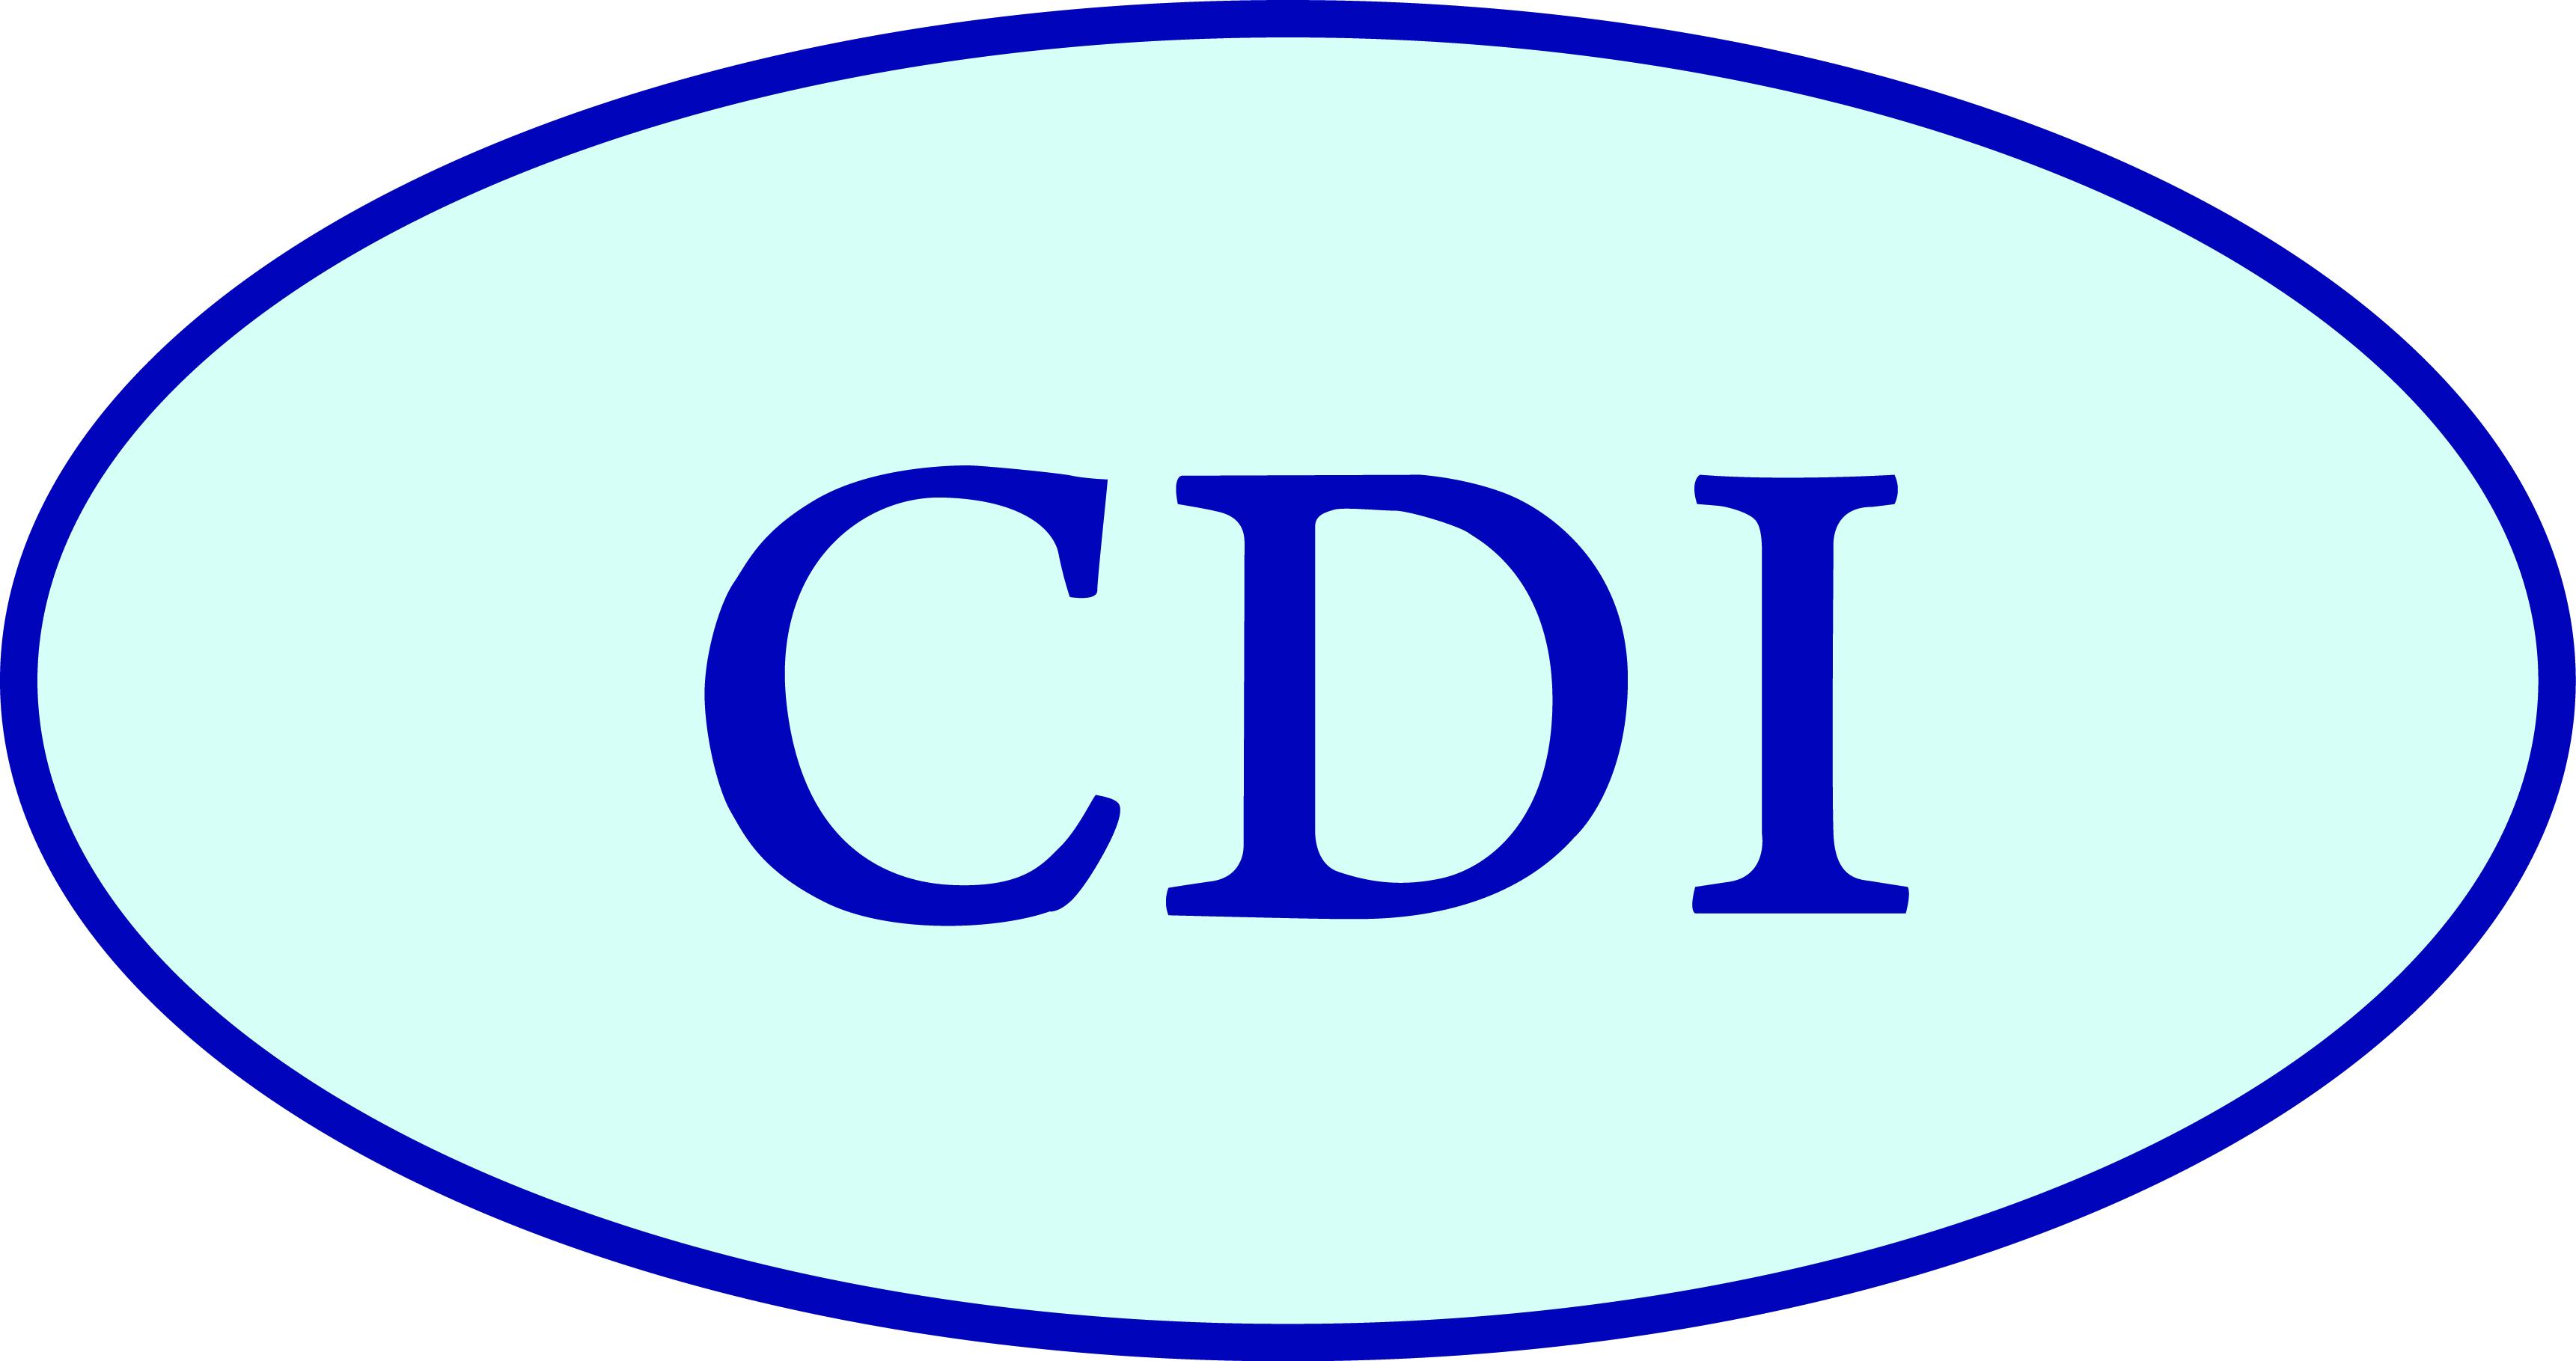 cdi-logo-blue.jpg